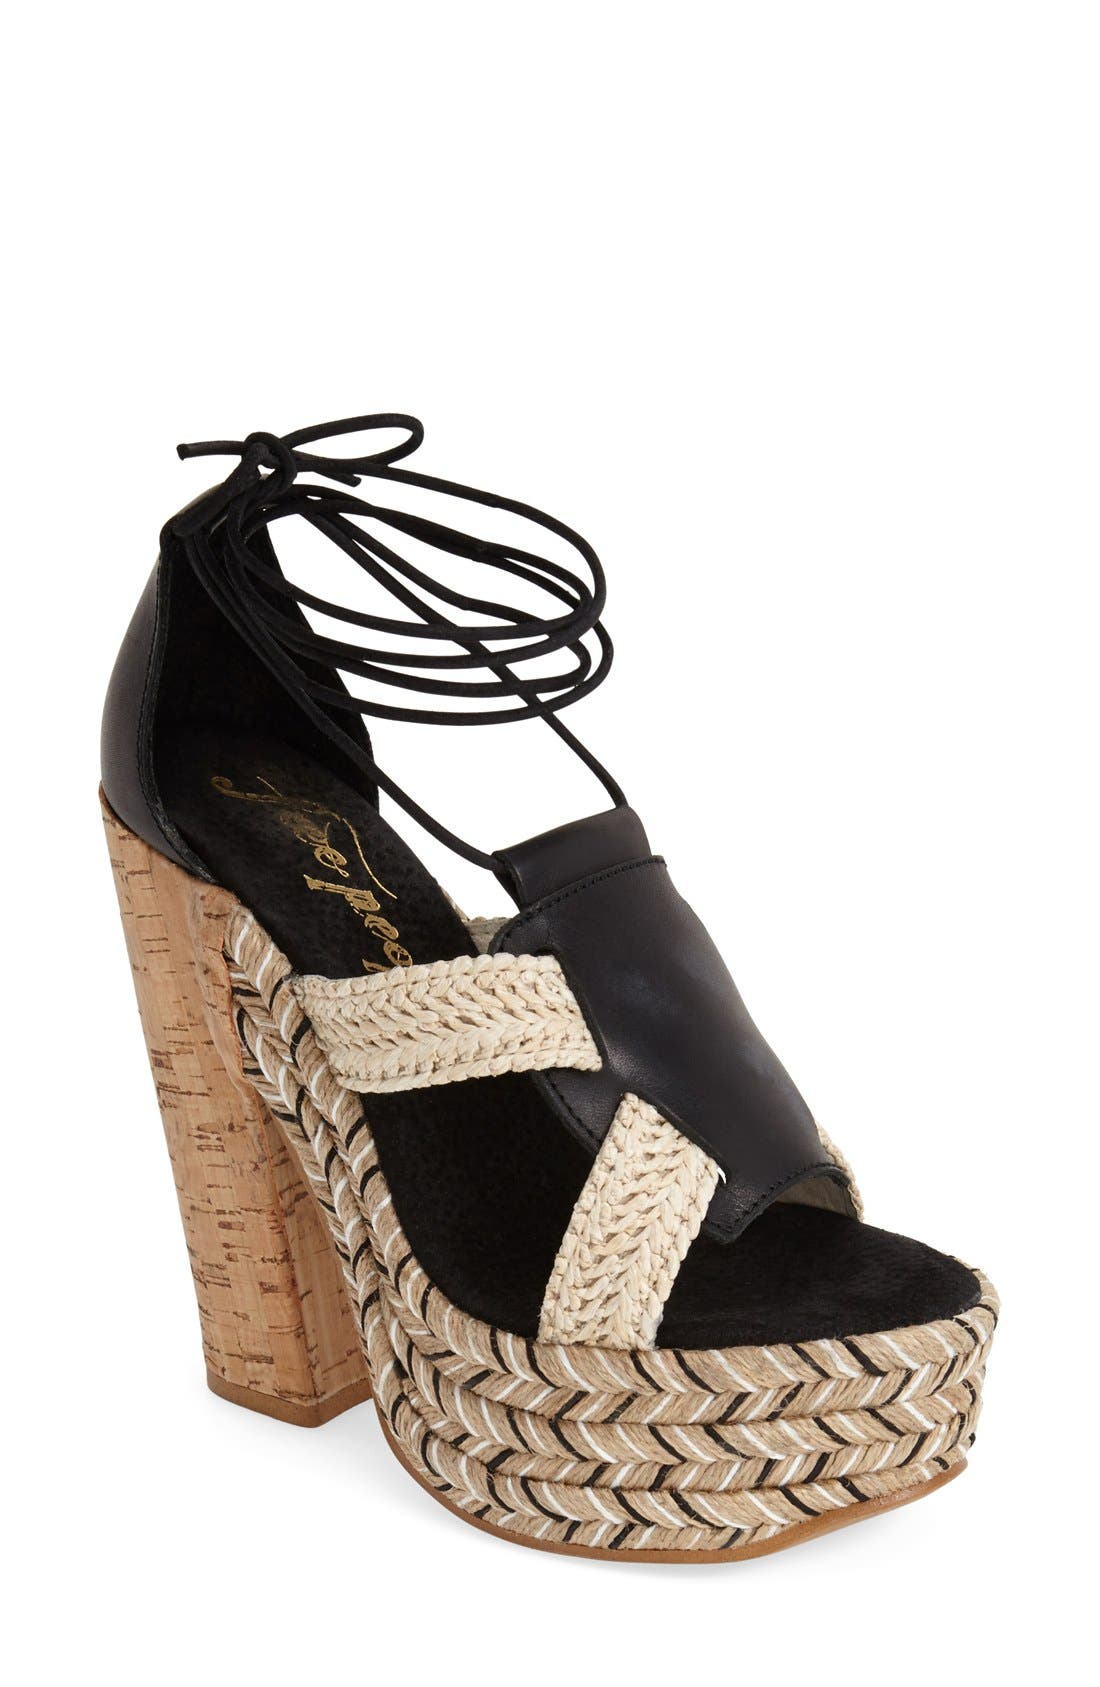 Alternate Image 1 Selected - Free People 'High Society' Platform Sandal (Women)